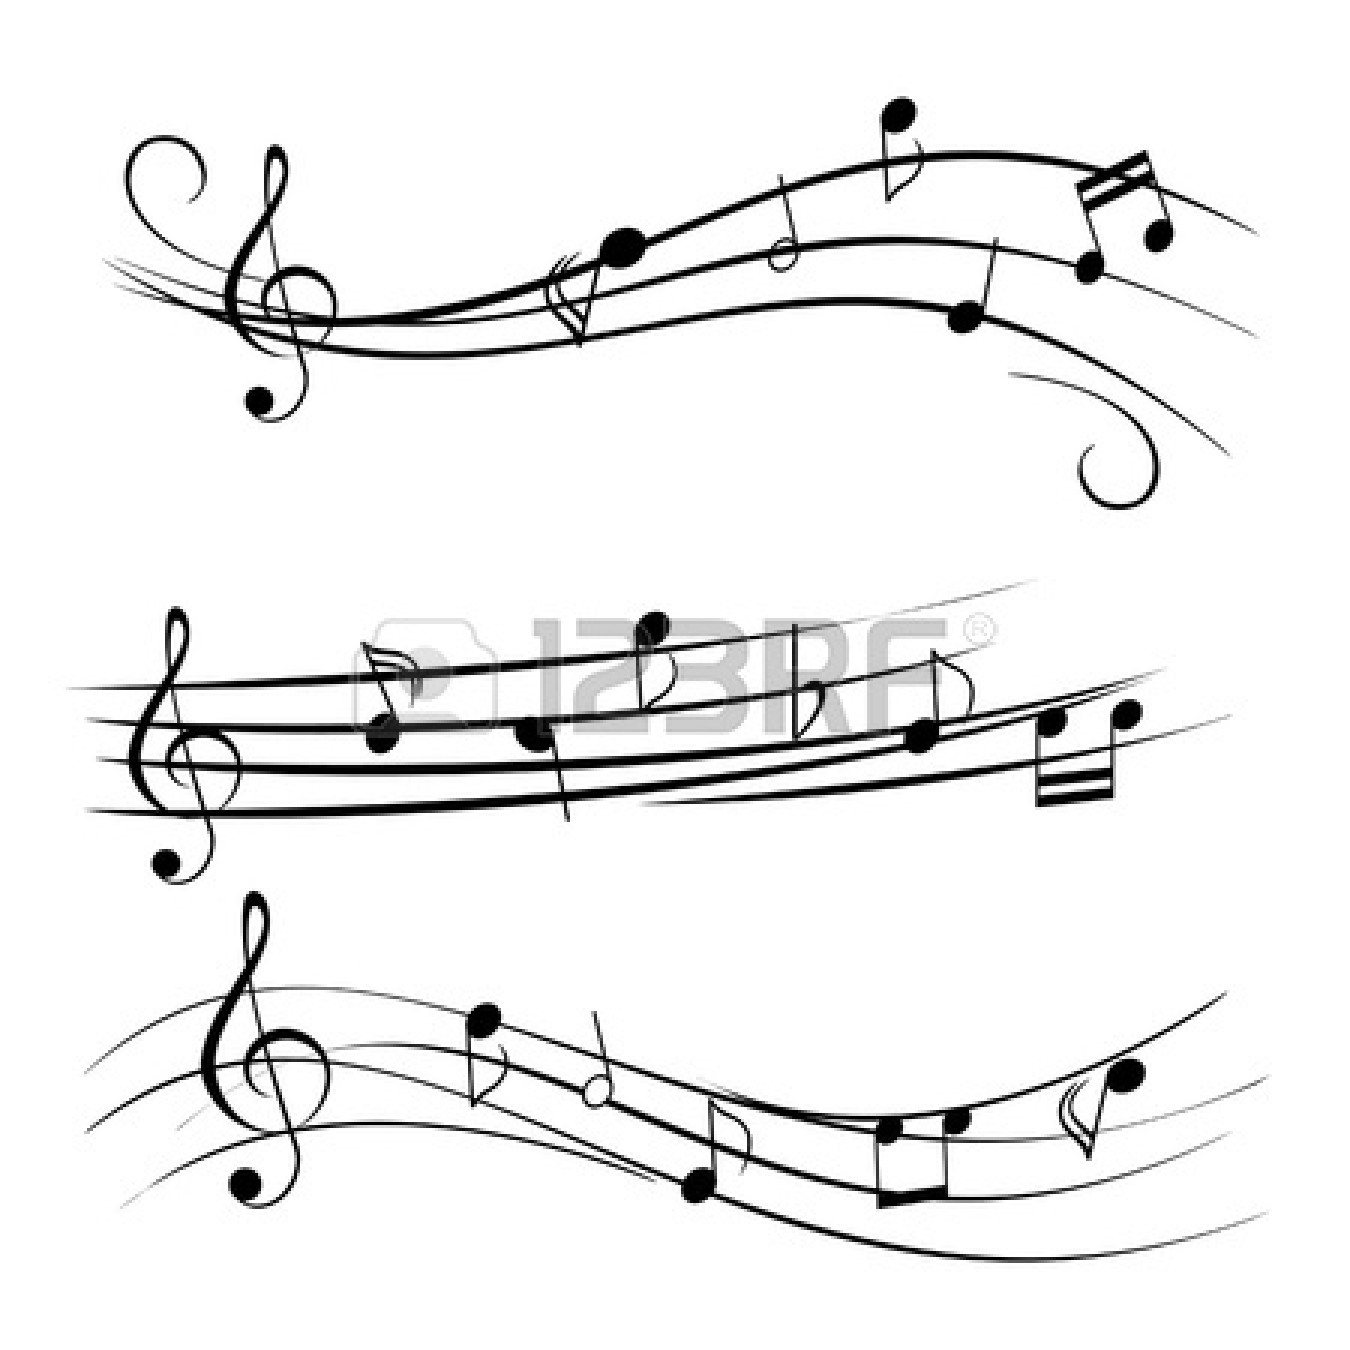 music notes border clip art clipart panda free clipart images rh clipartpanda com music page border clip art music note clipart border